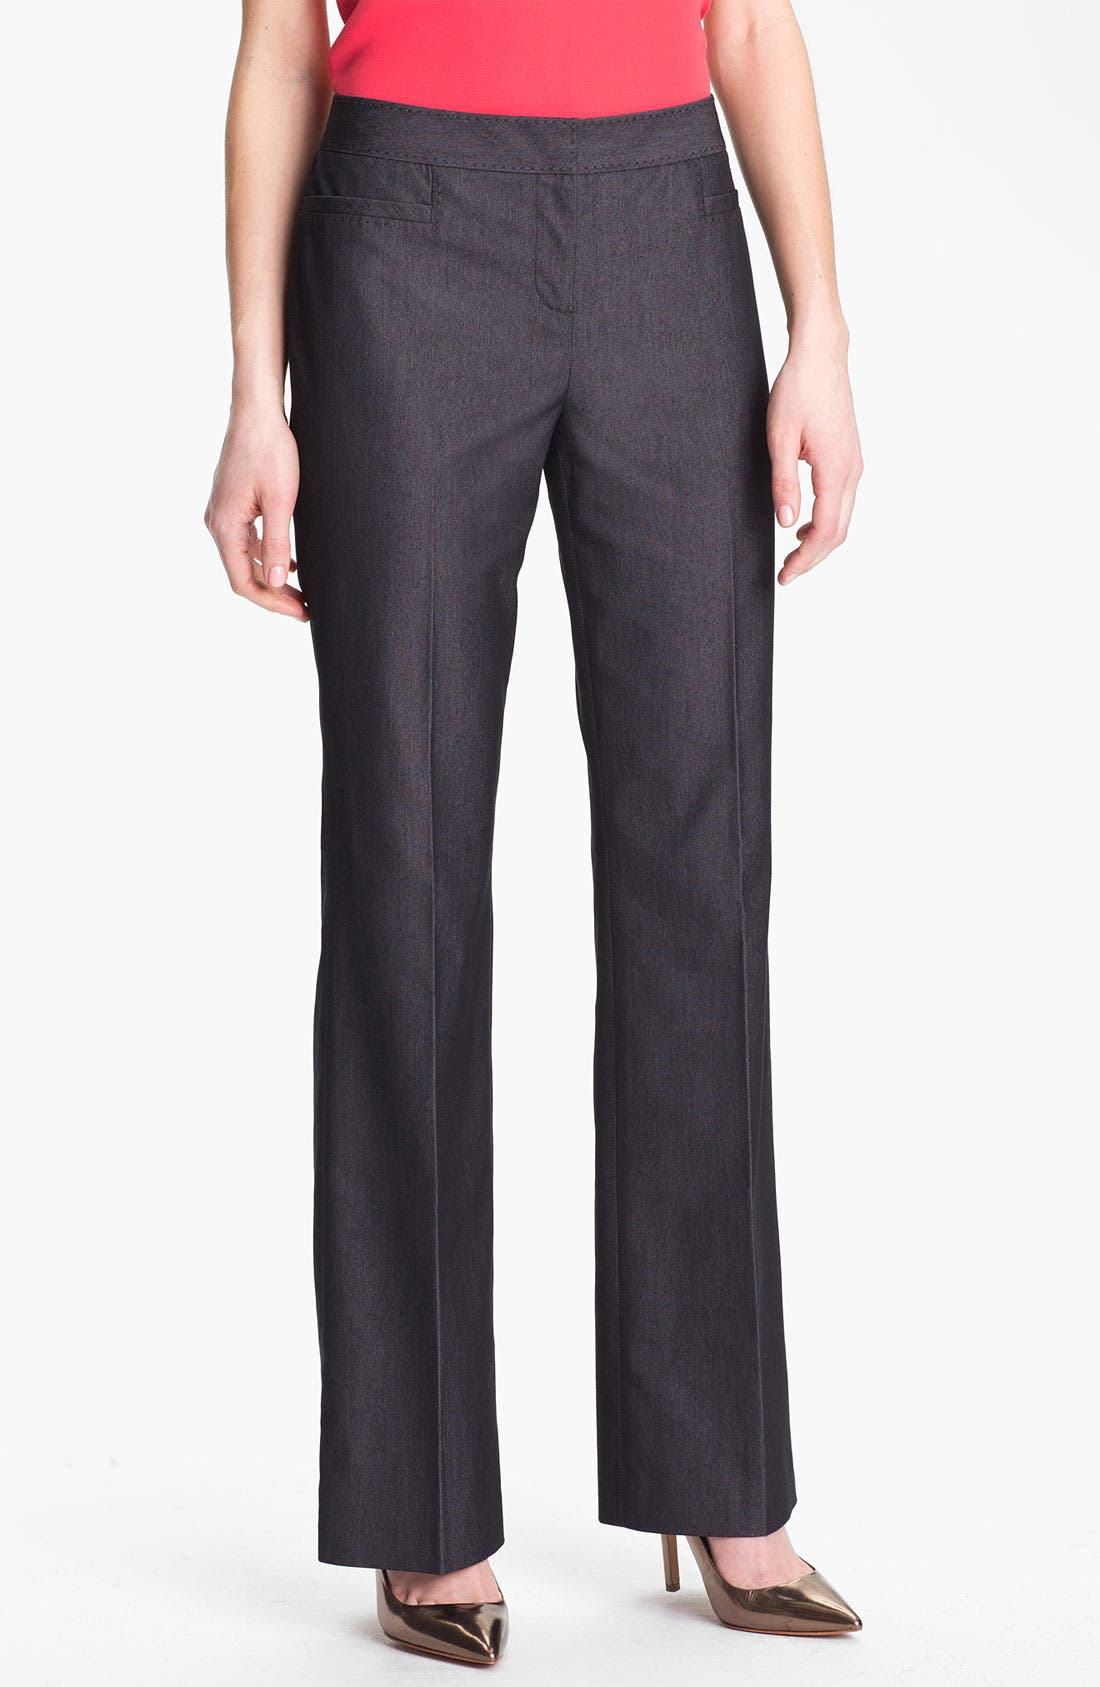 Main Image - Halogen® 'Taylor' Curvy Fit Black Denim Pants